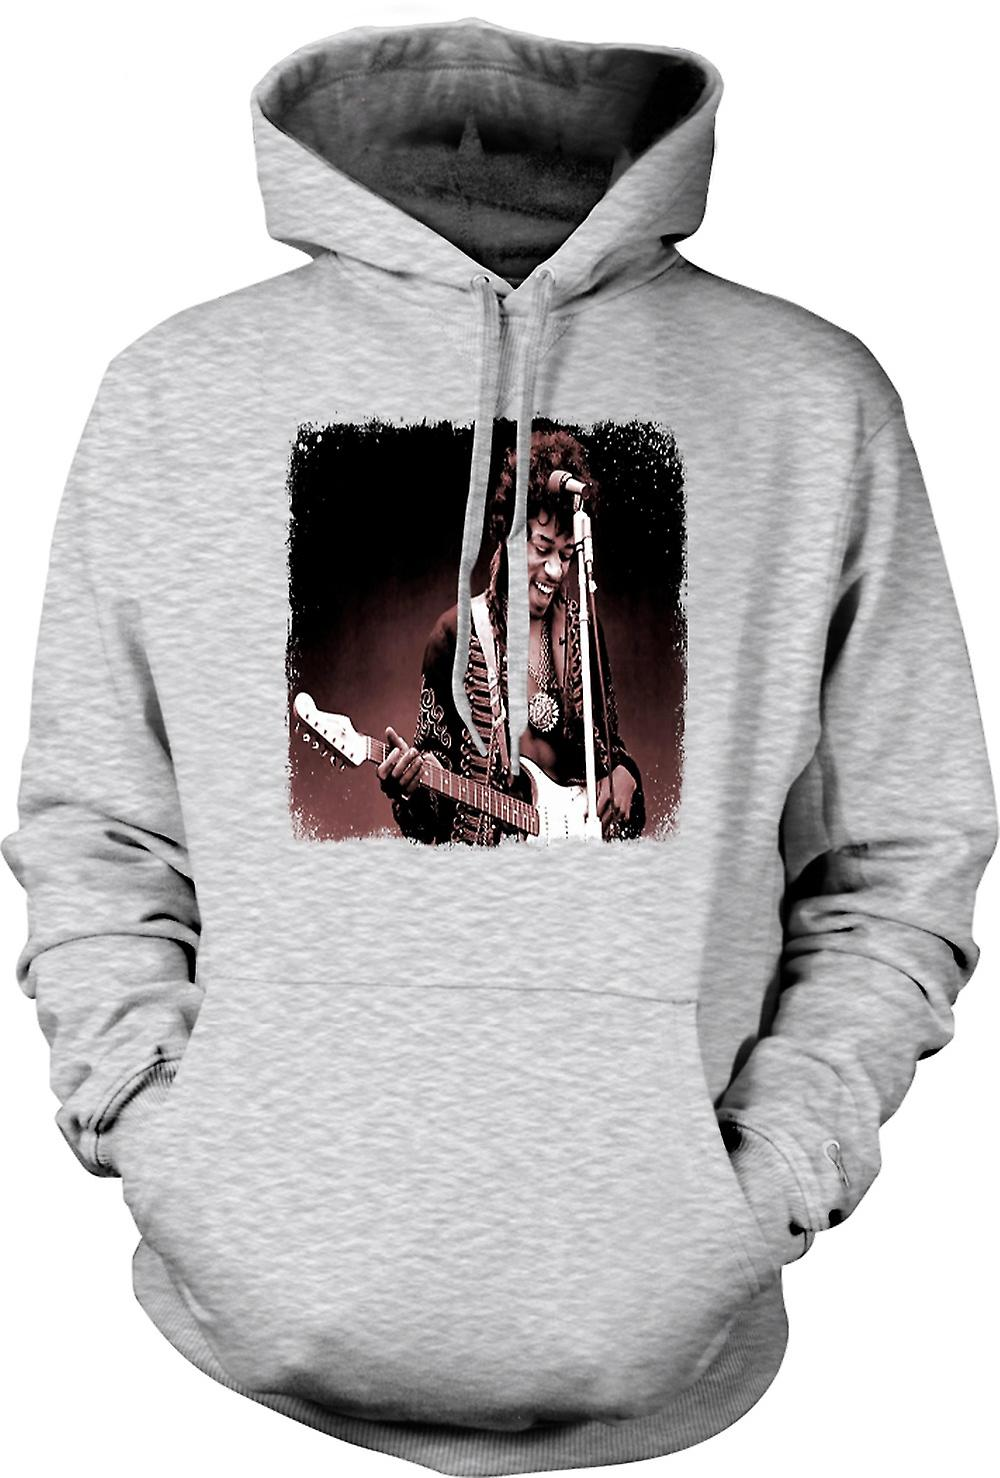 Mens-Hoodie - Jimi Hendrix - Sepia - Portrait